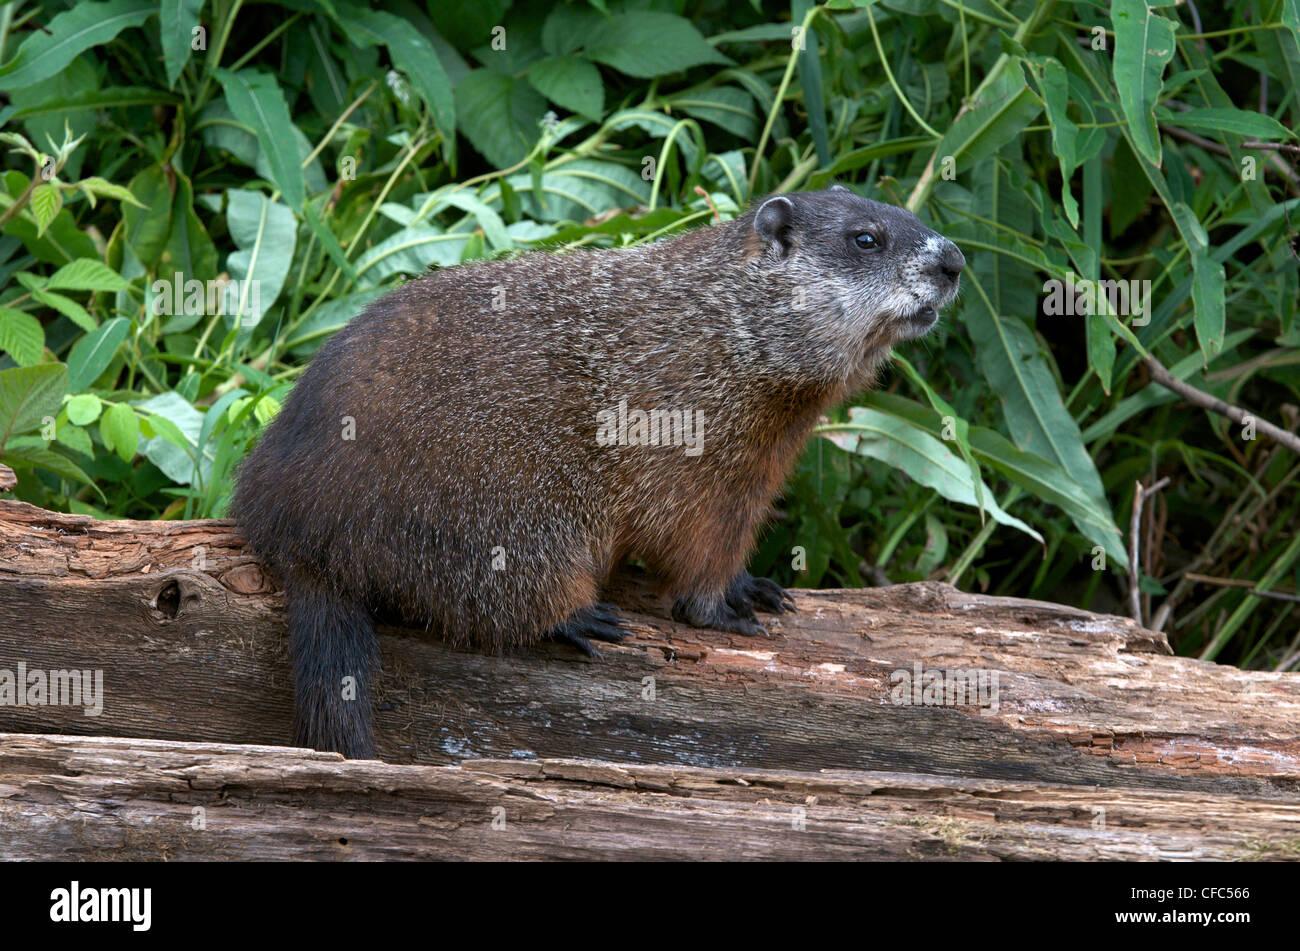 Woodchuck or groundhog (Marmota monax) in summer vegetation. Ontario, Canada. - Stock Image